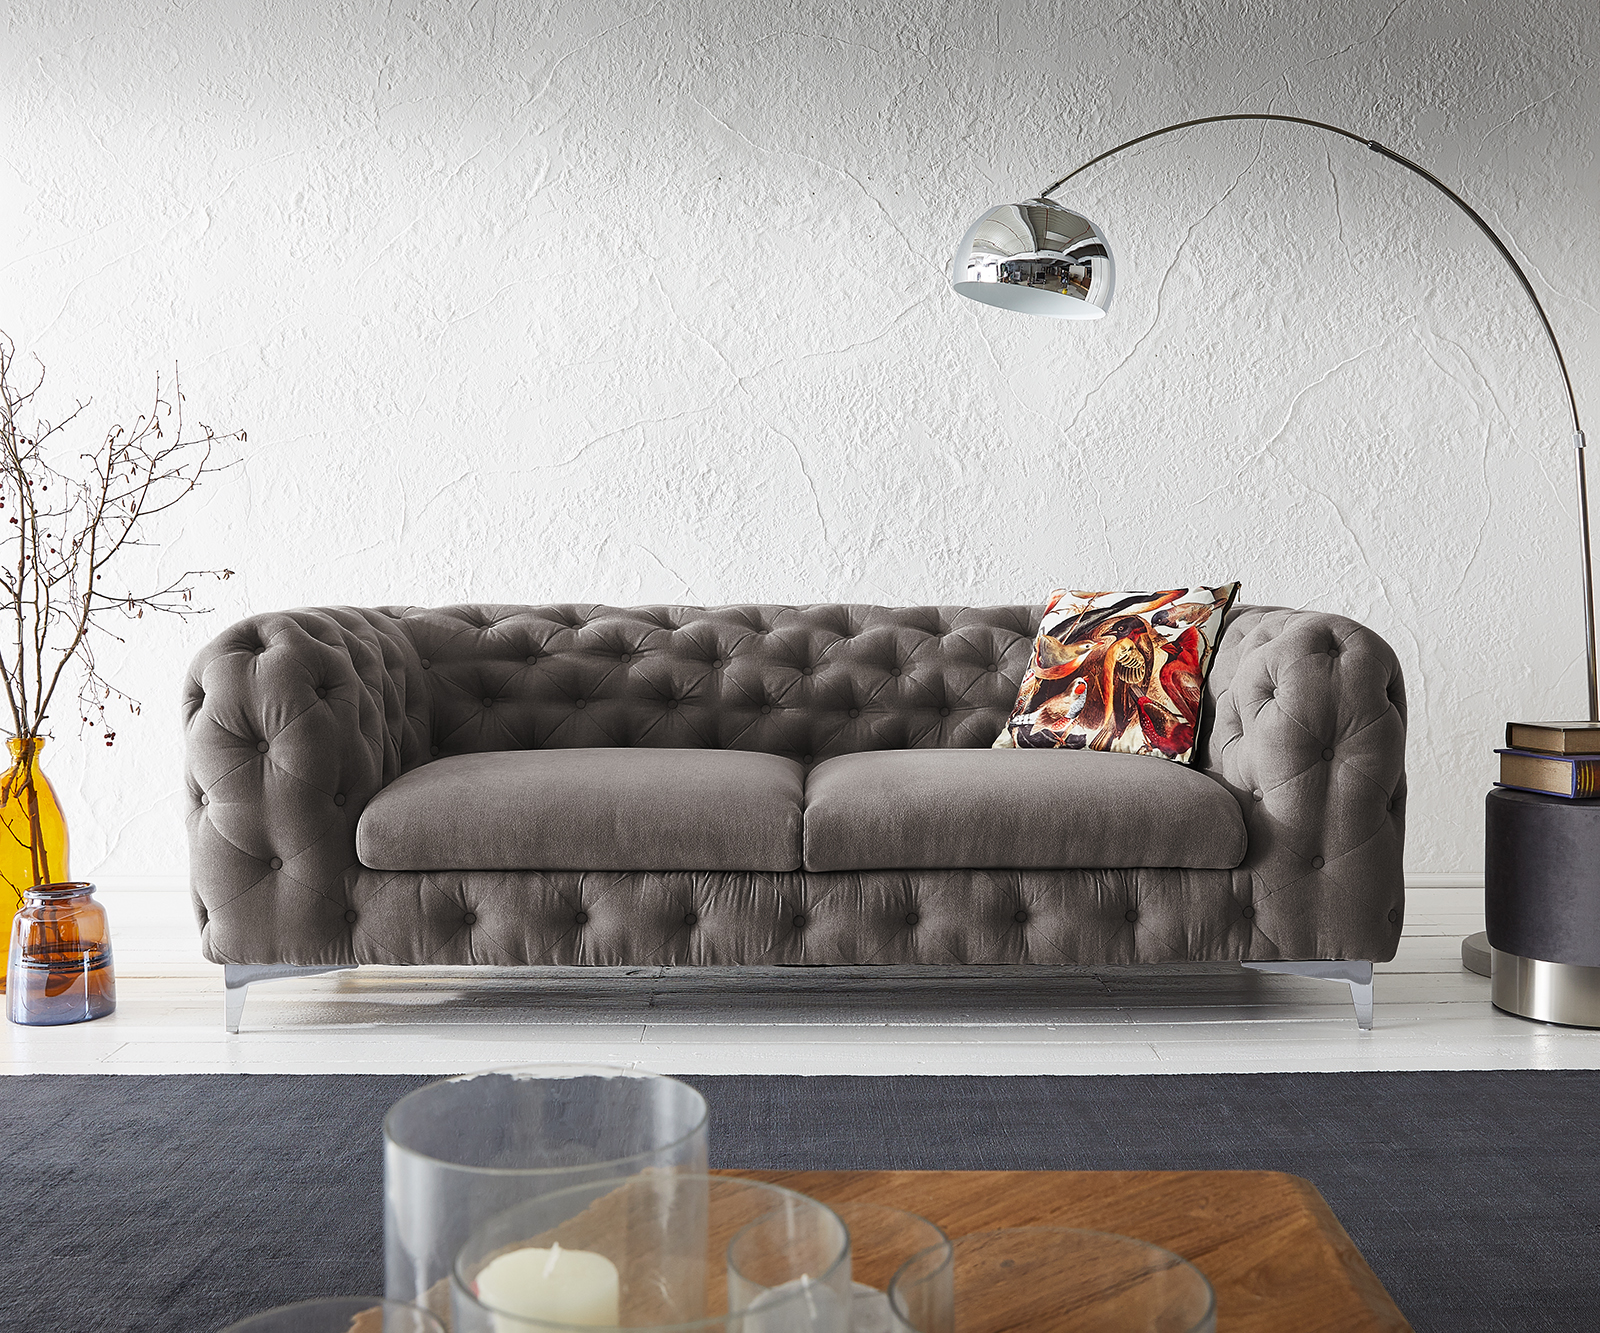 Couch Corleone 225x97 cm Khakibraun 3-Sitzer Sofa